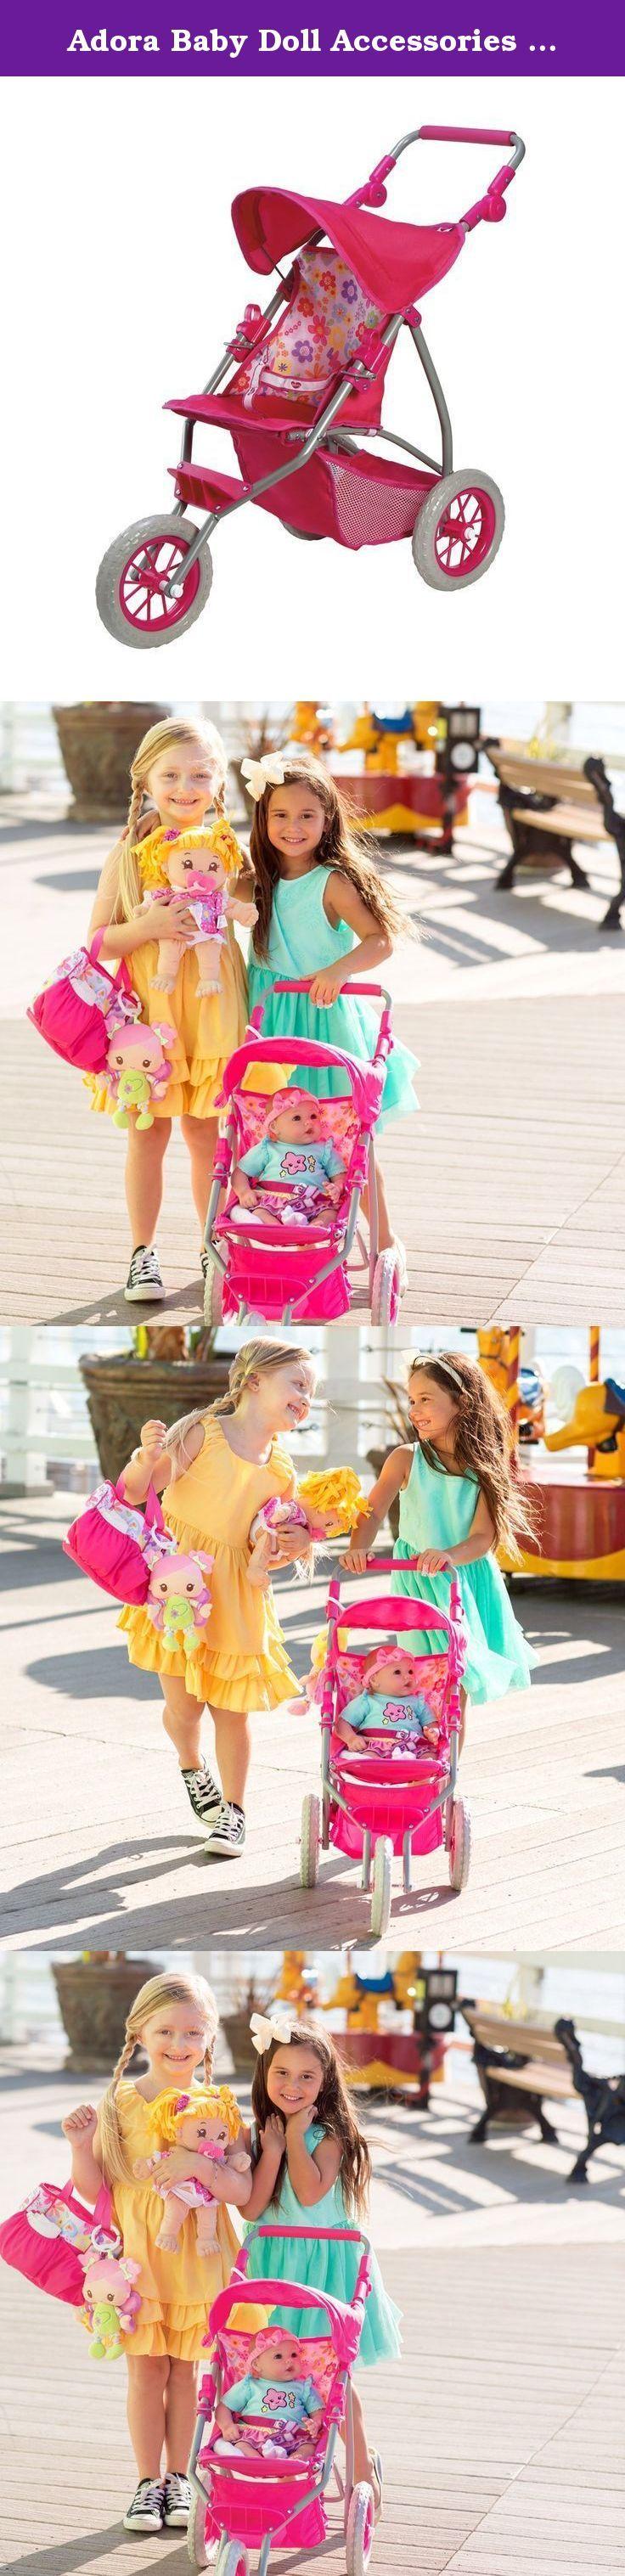 Adora Baby Doll Accessories Adjustable Handle 3 Wheel Shade Jogger with Under Storage Stroller